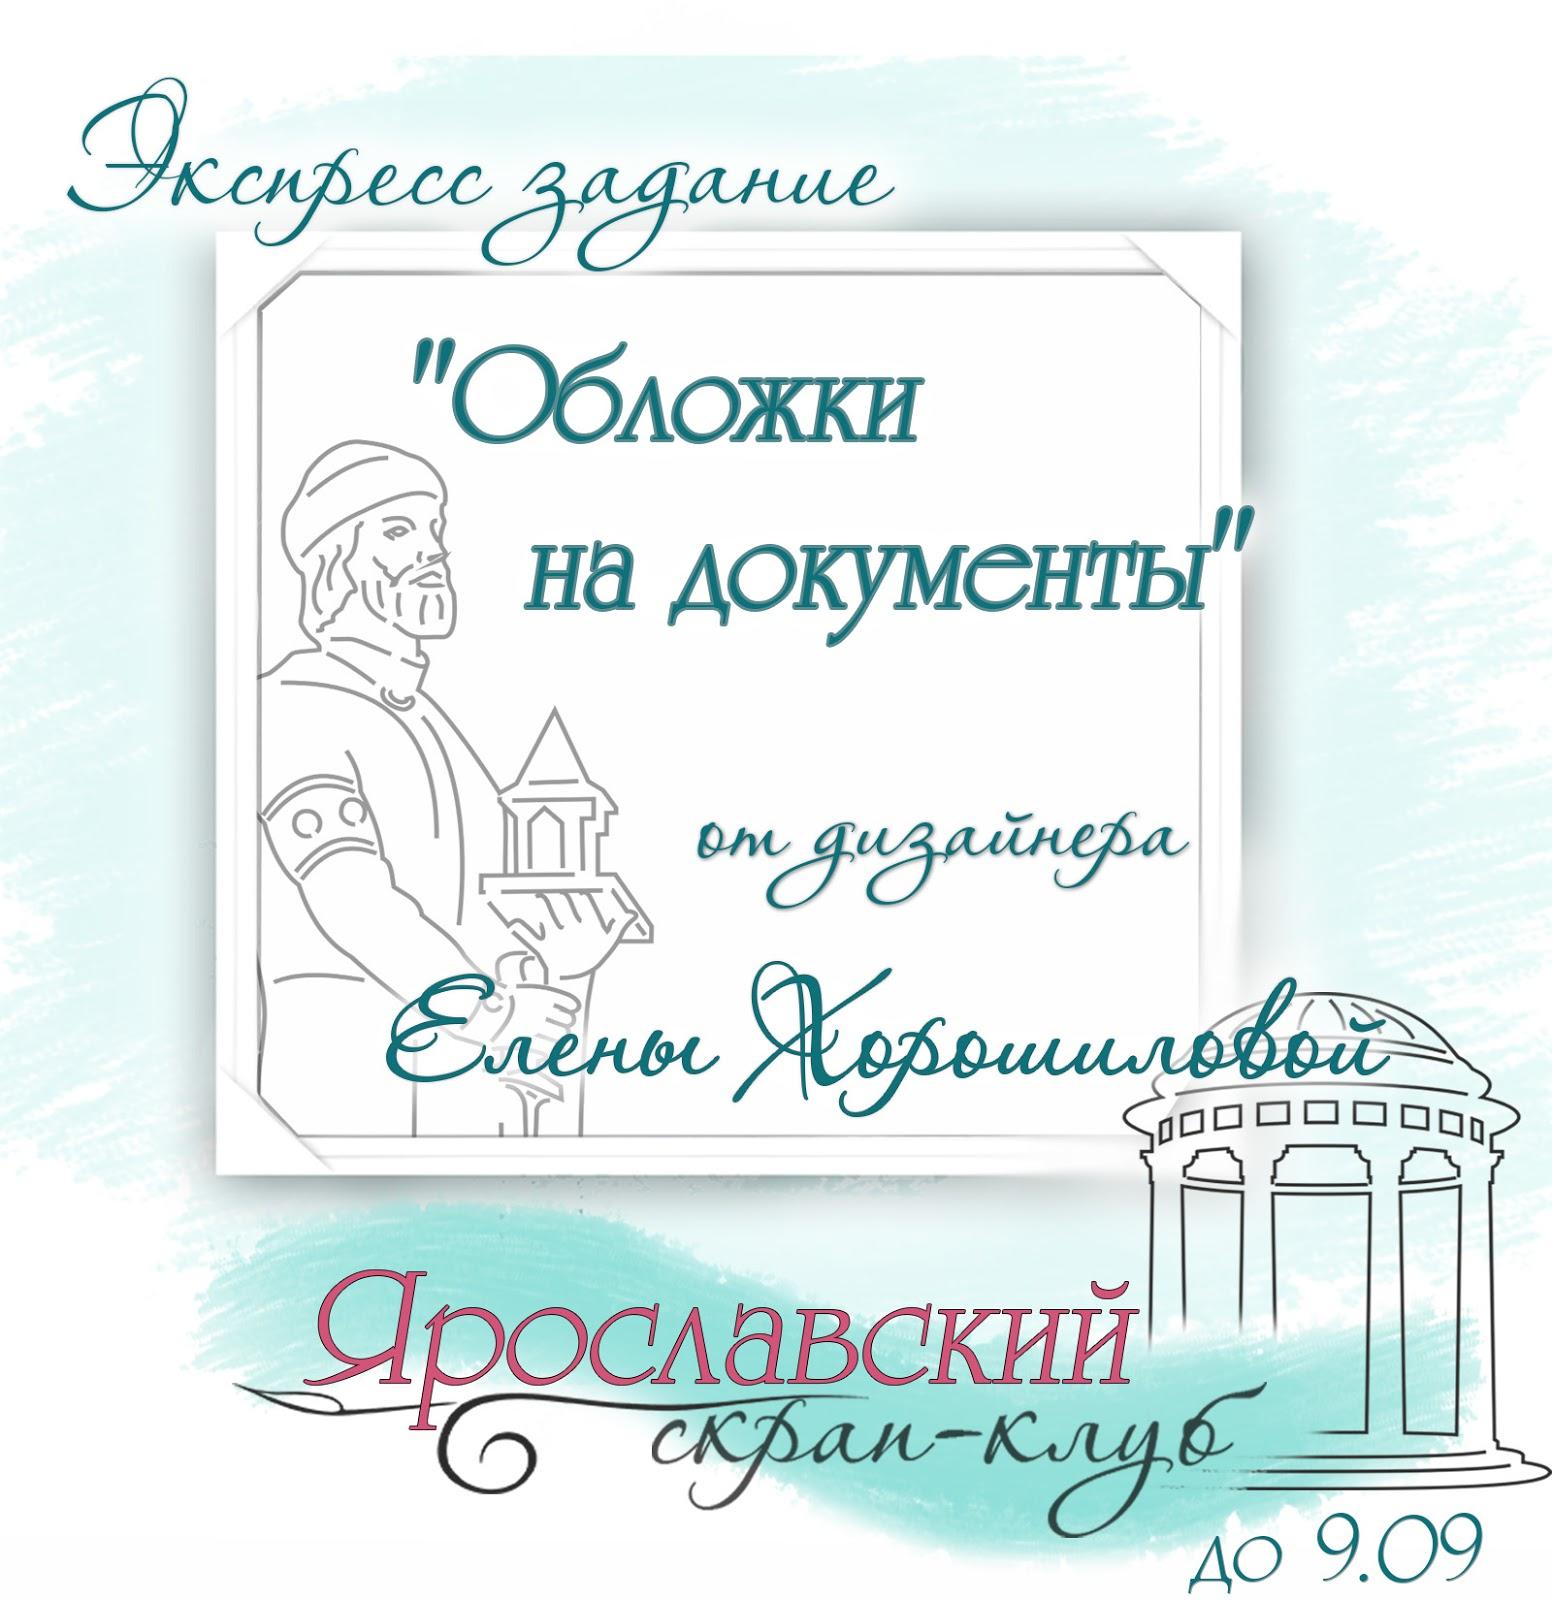 """Обложки на документы"" до 09.09.2018"